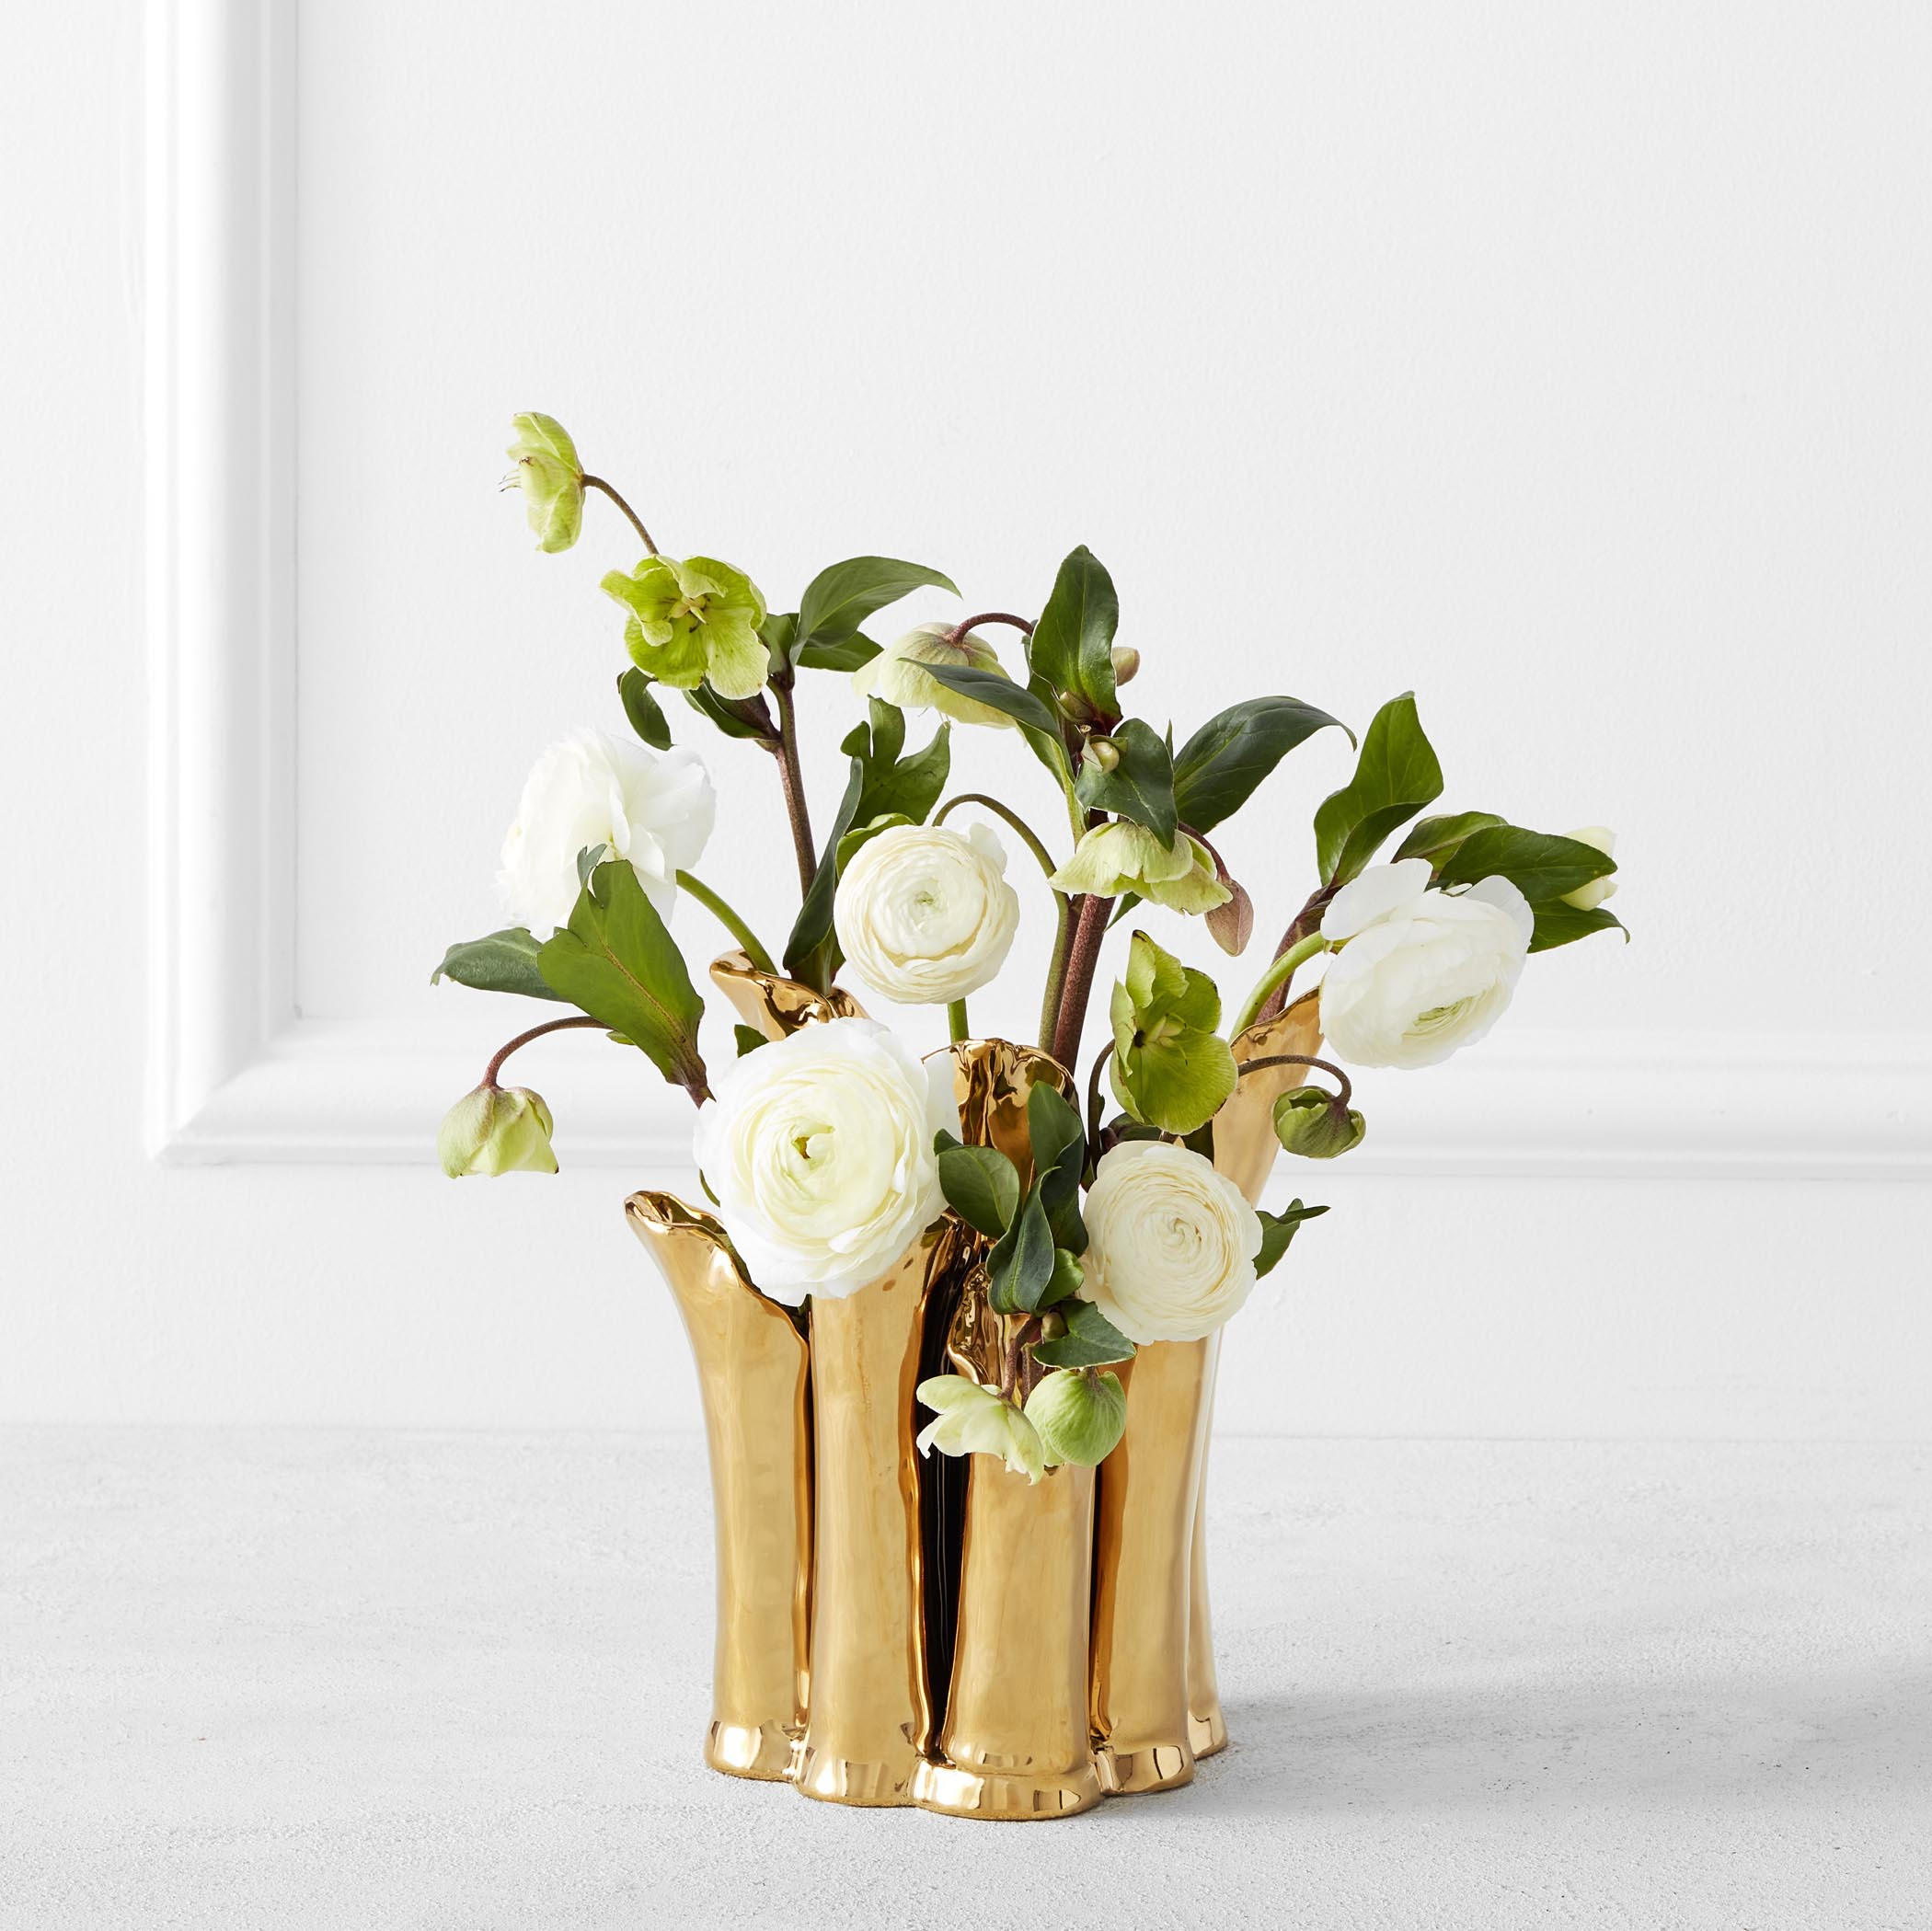 Marlin Vase